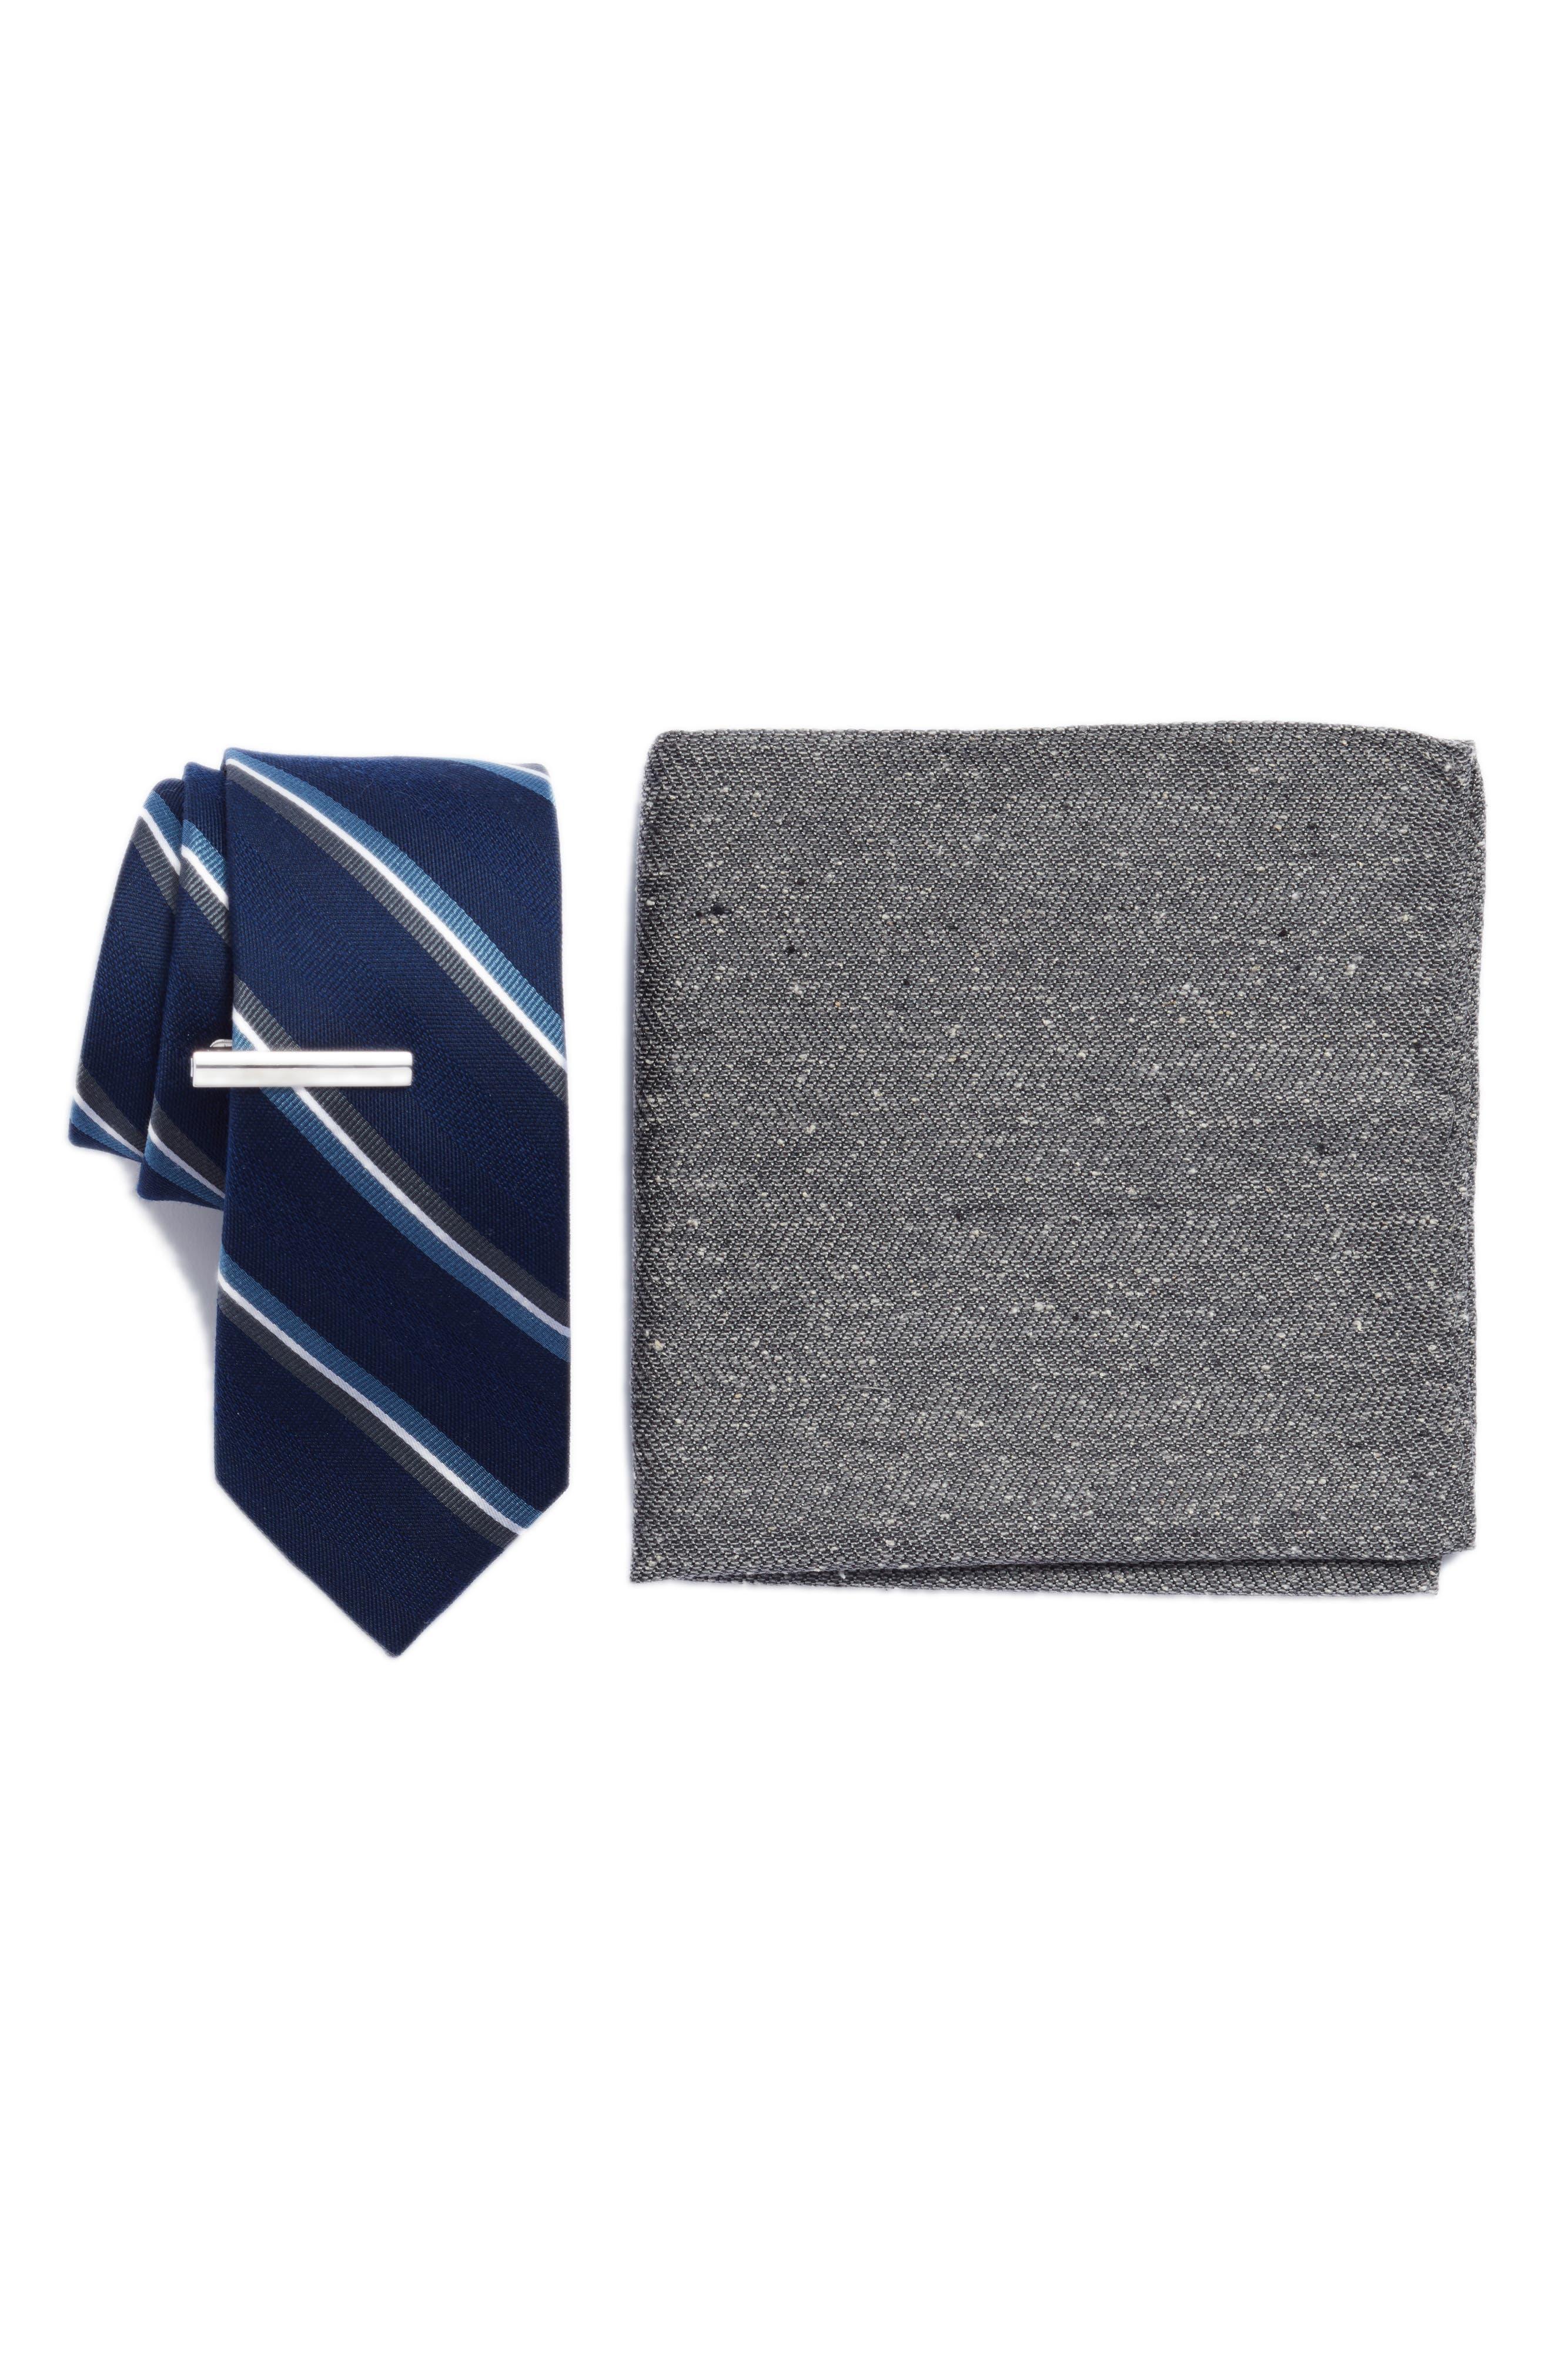 THE TIE BAR, Short Cut Stripe 3-Piece Skinny Tie Style Box, Main thumbnail 1, color, 410